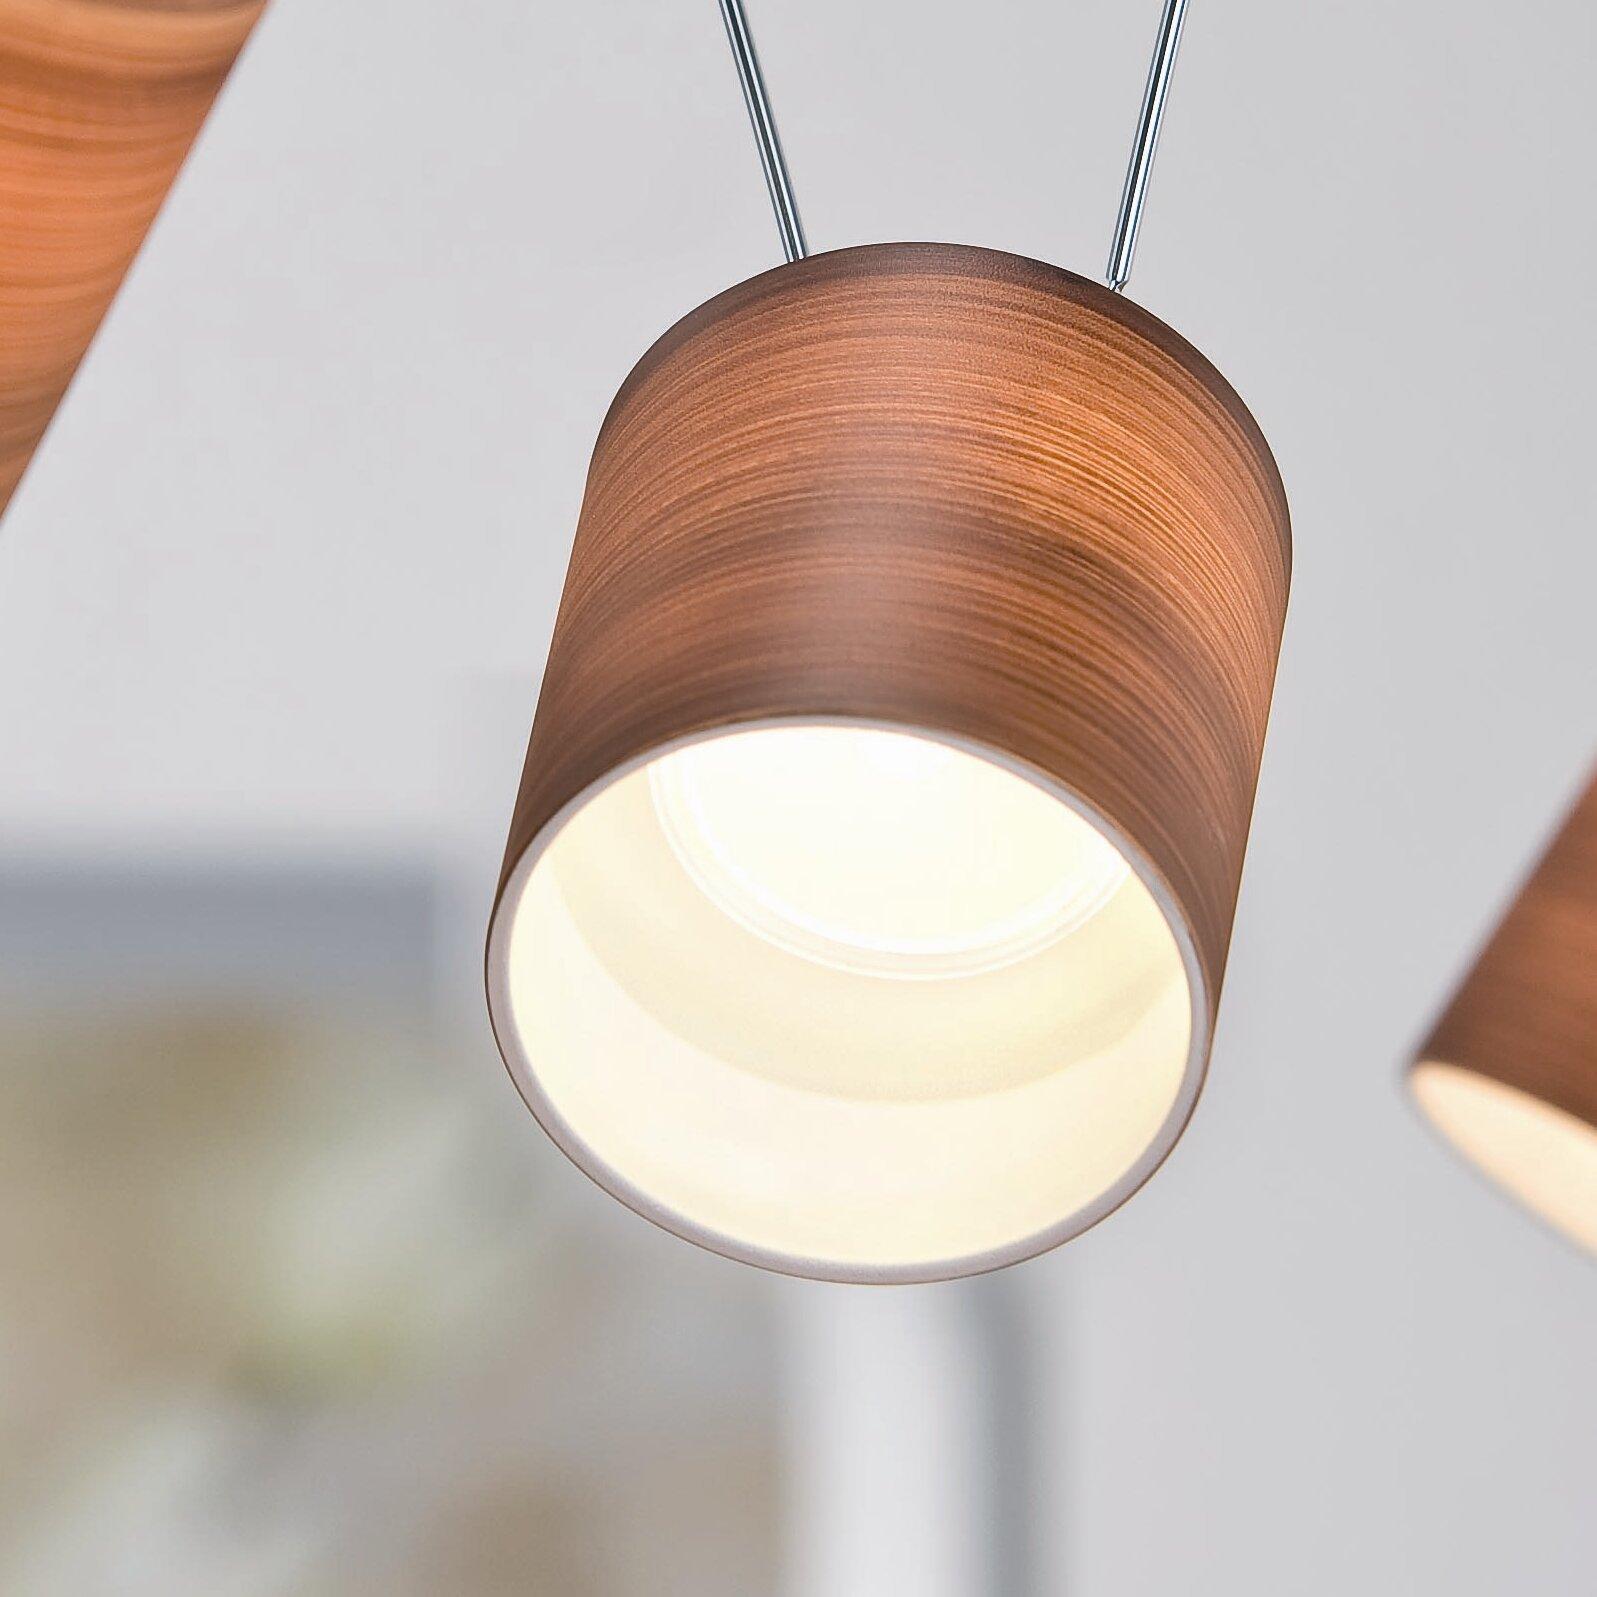 paulmann 7 cm lampenschirm zyli aus glas reviews von. Black Bedroom Furniture Sets. Home Design Ideas